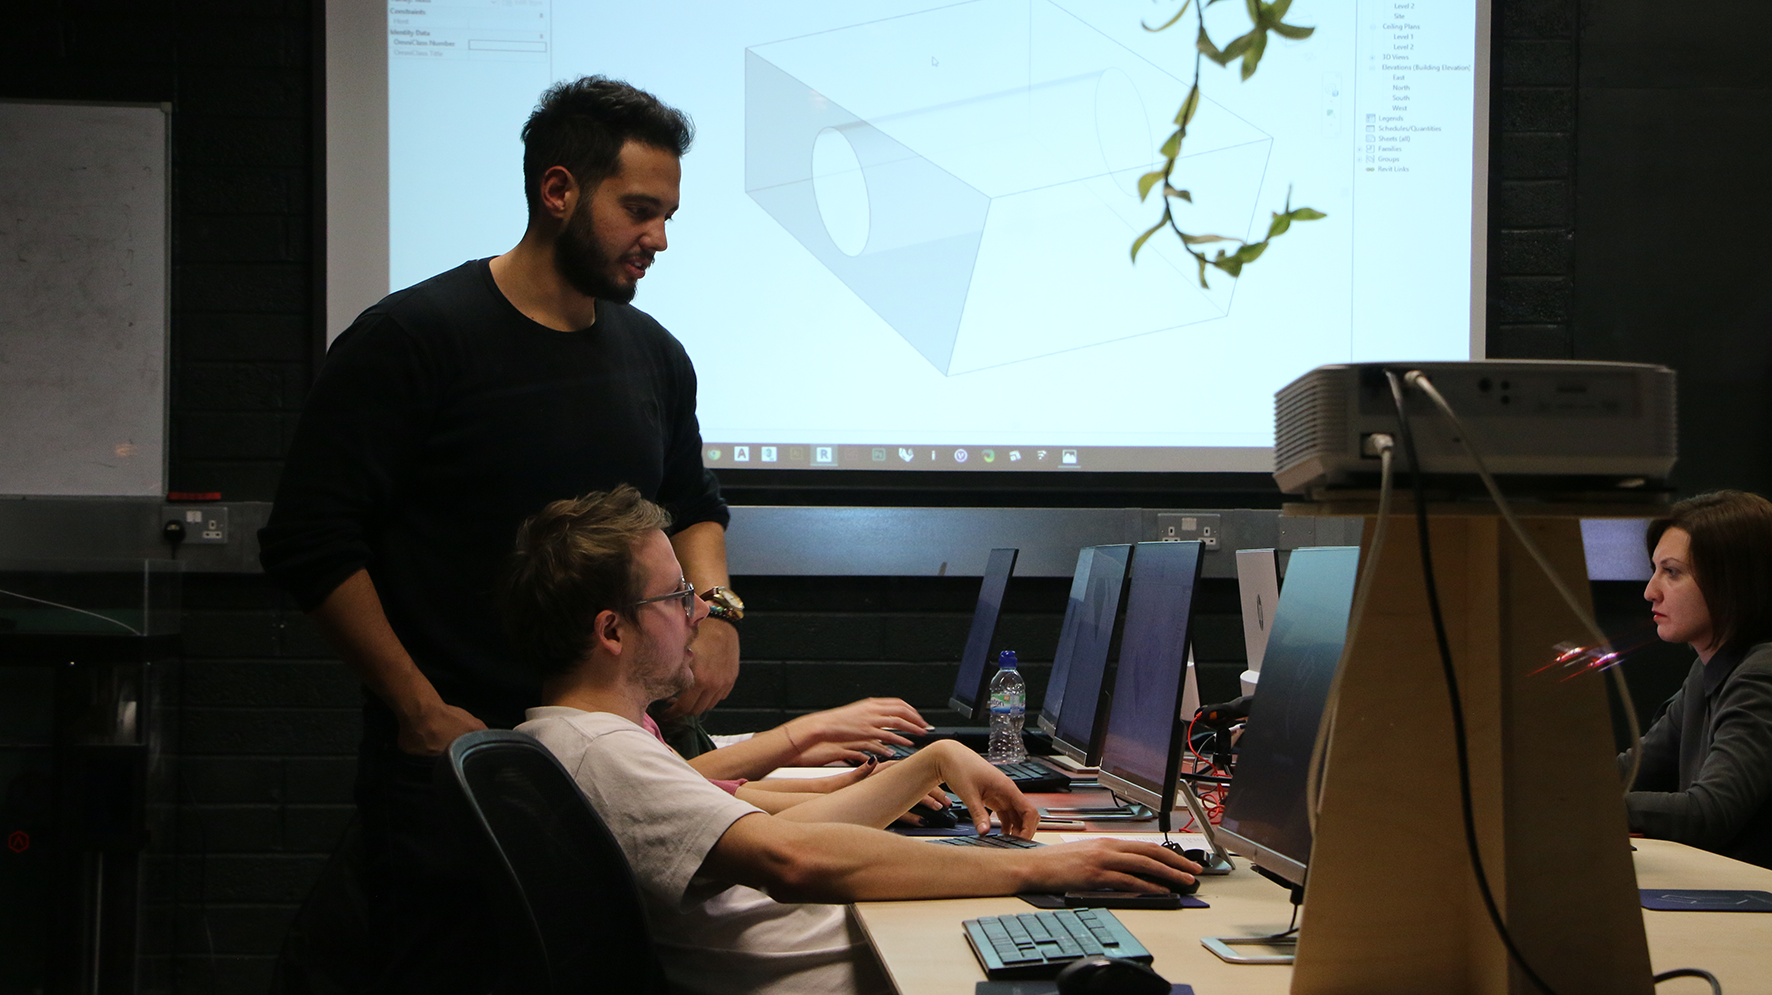 London Software Training Classroom 2